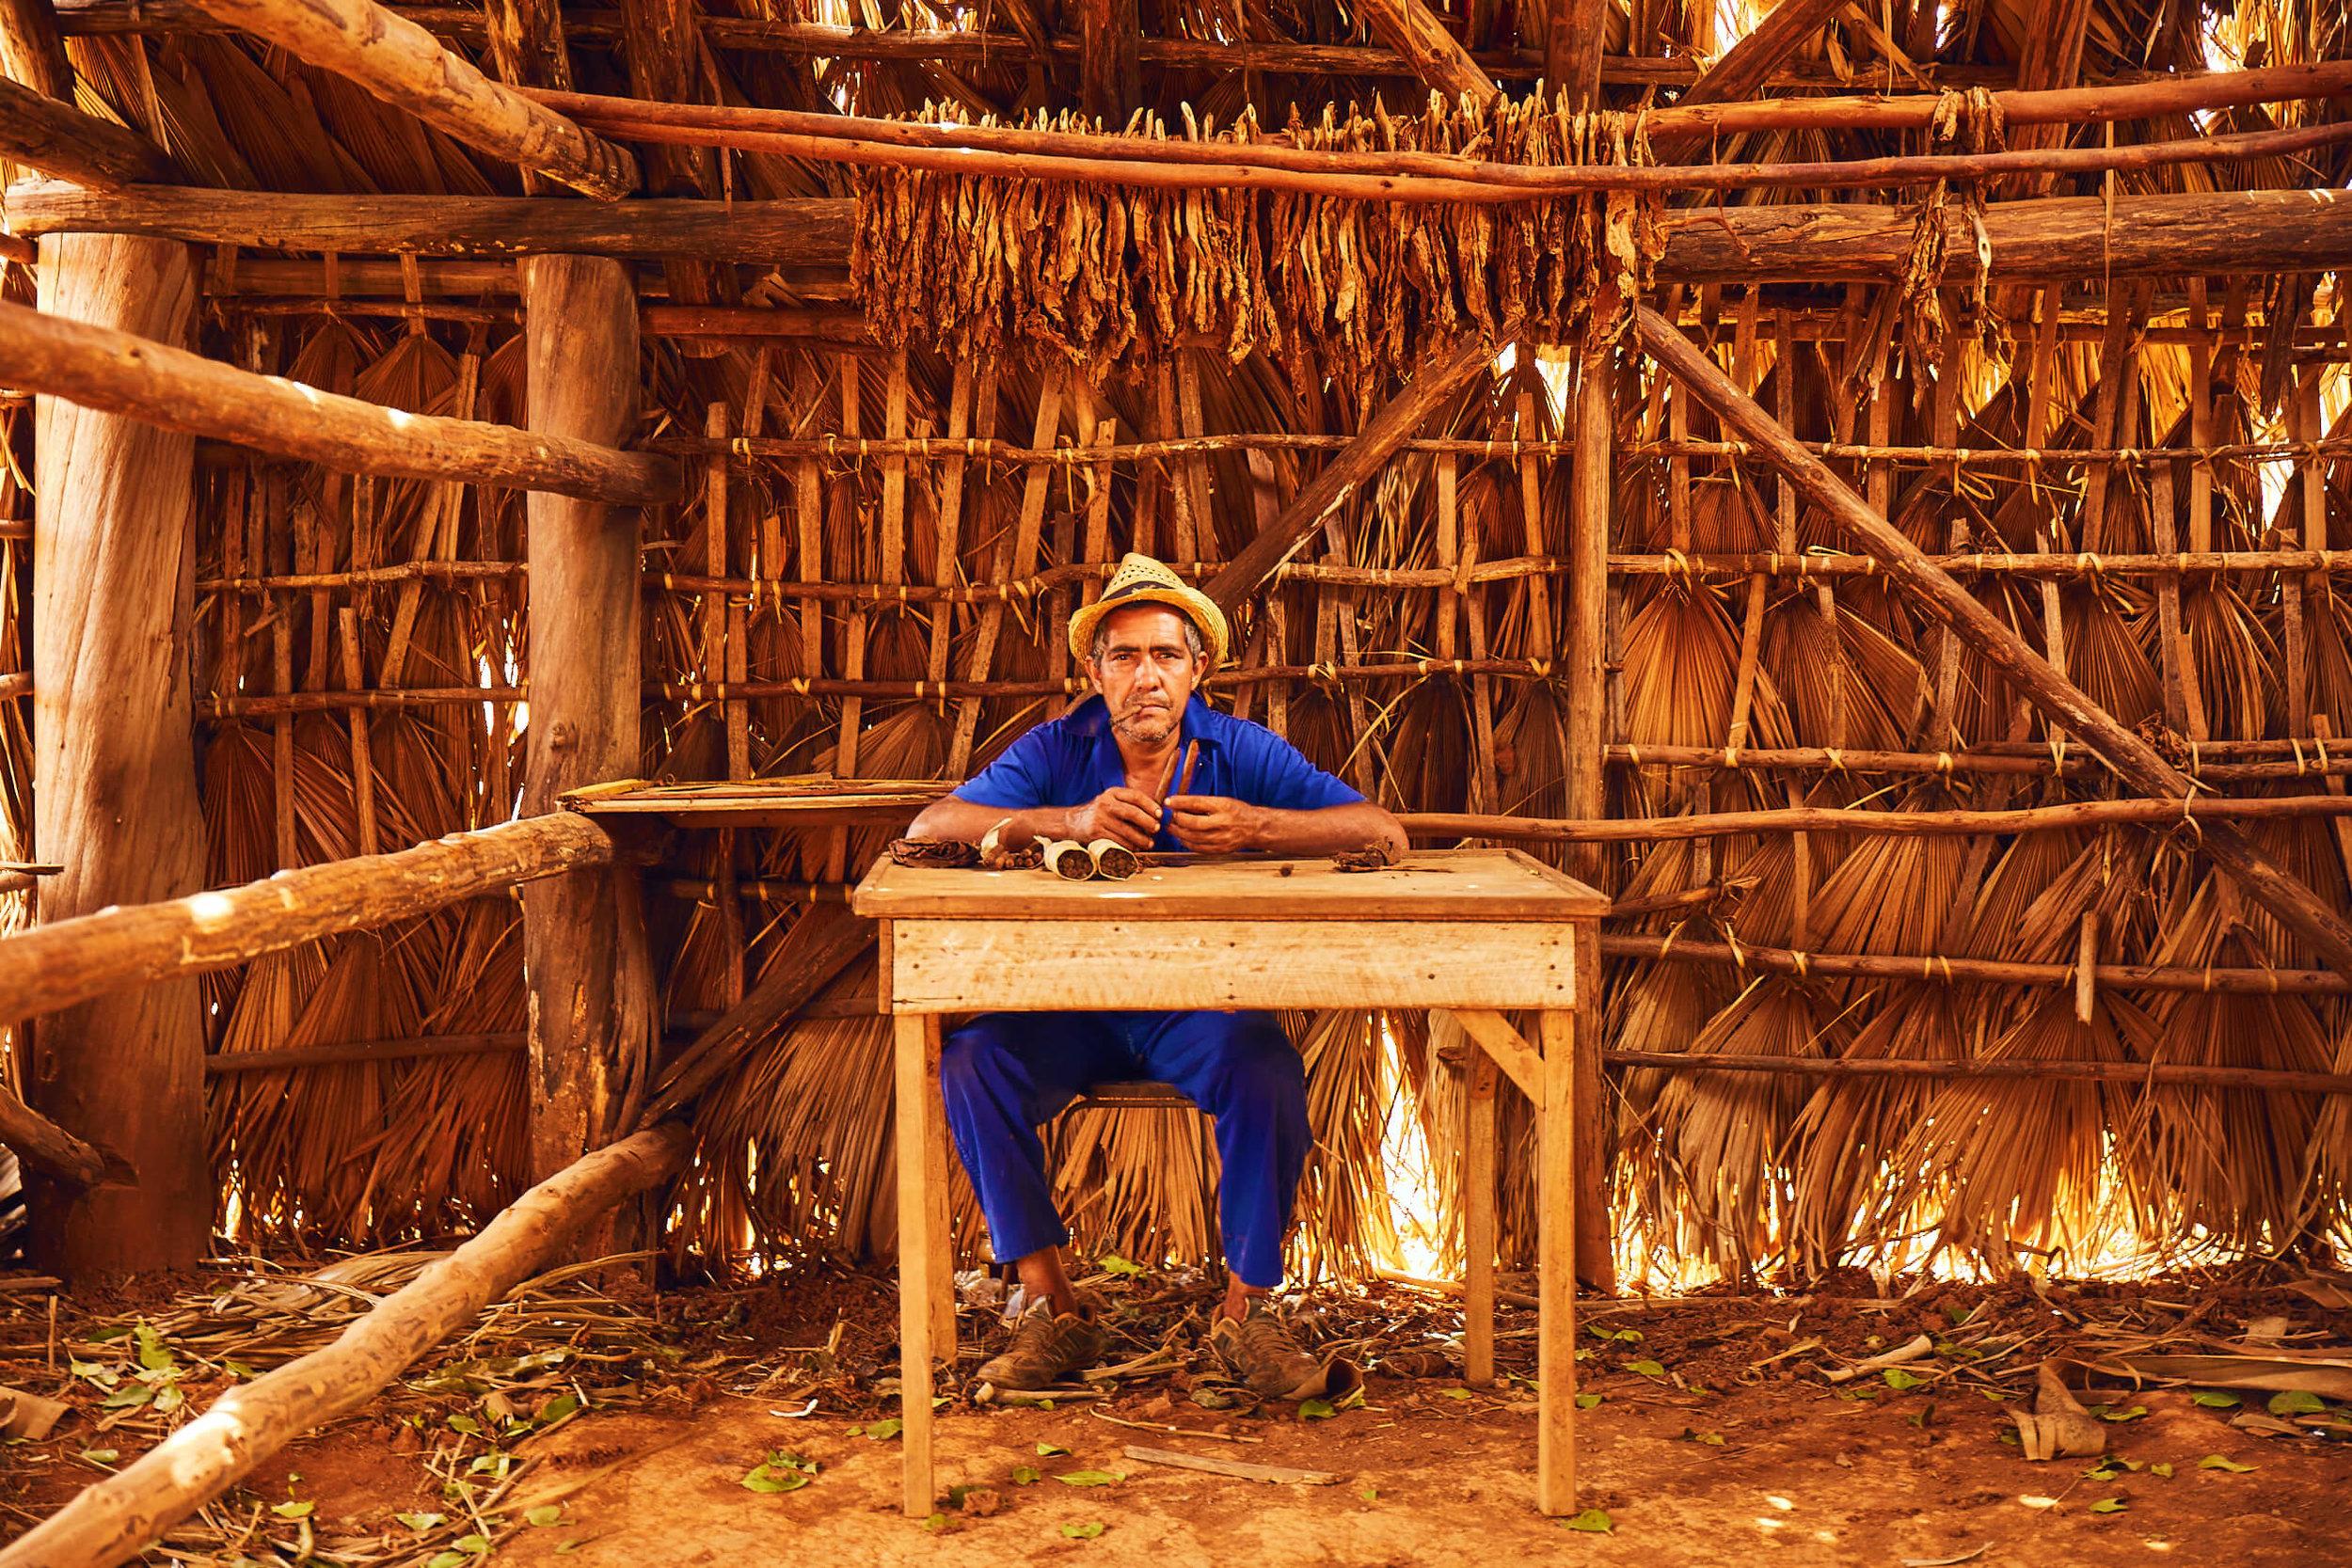 vinales_cuba_tobacco_farmer.jpg